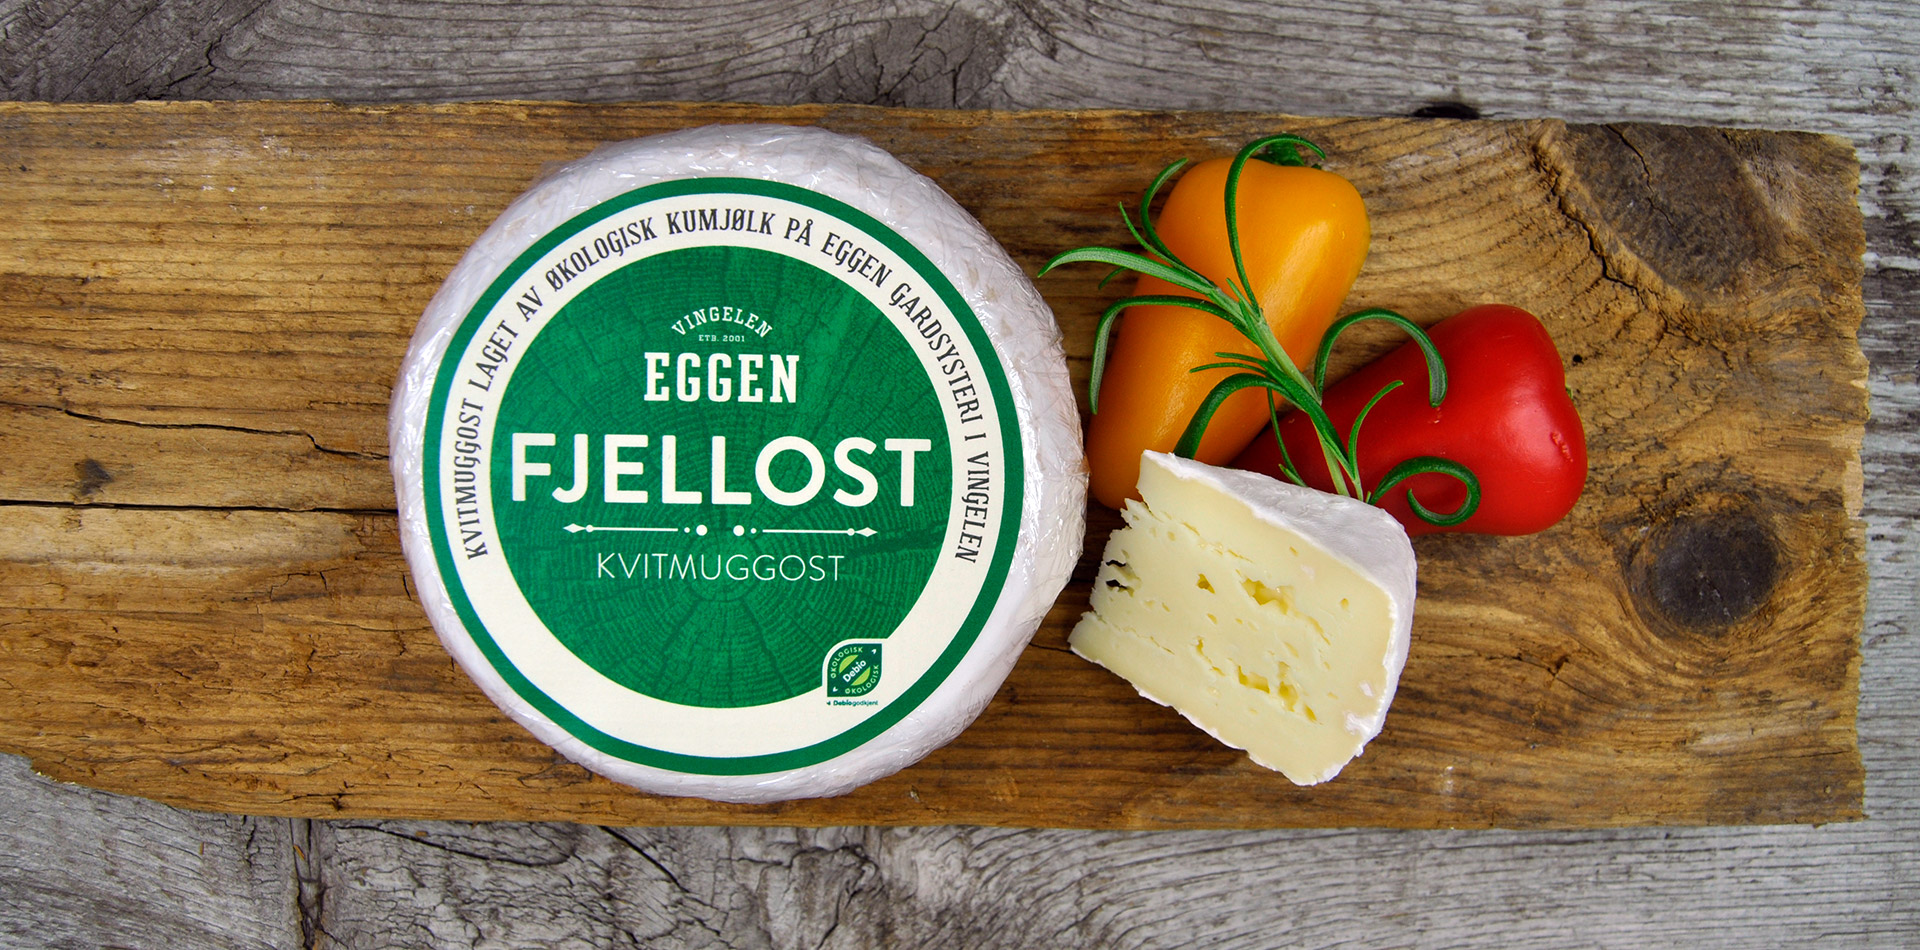 Eggen Fjellost - Kvitmuggost